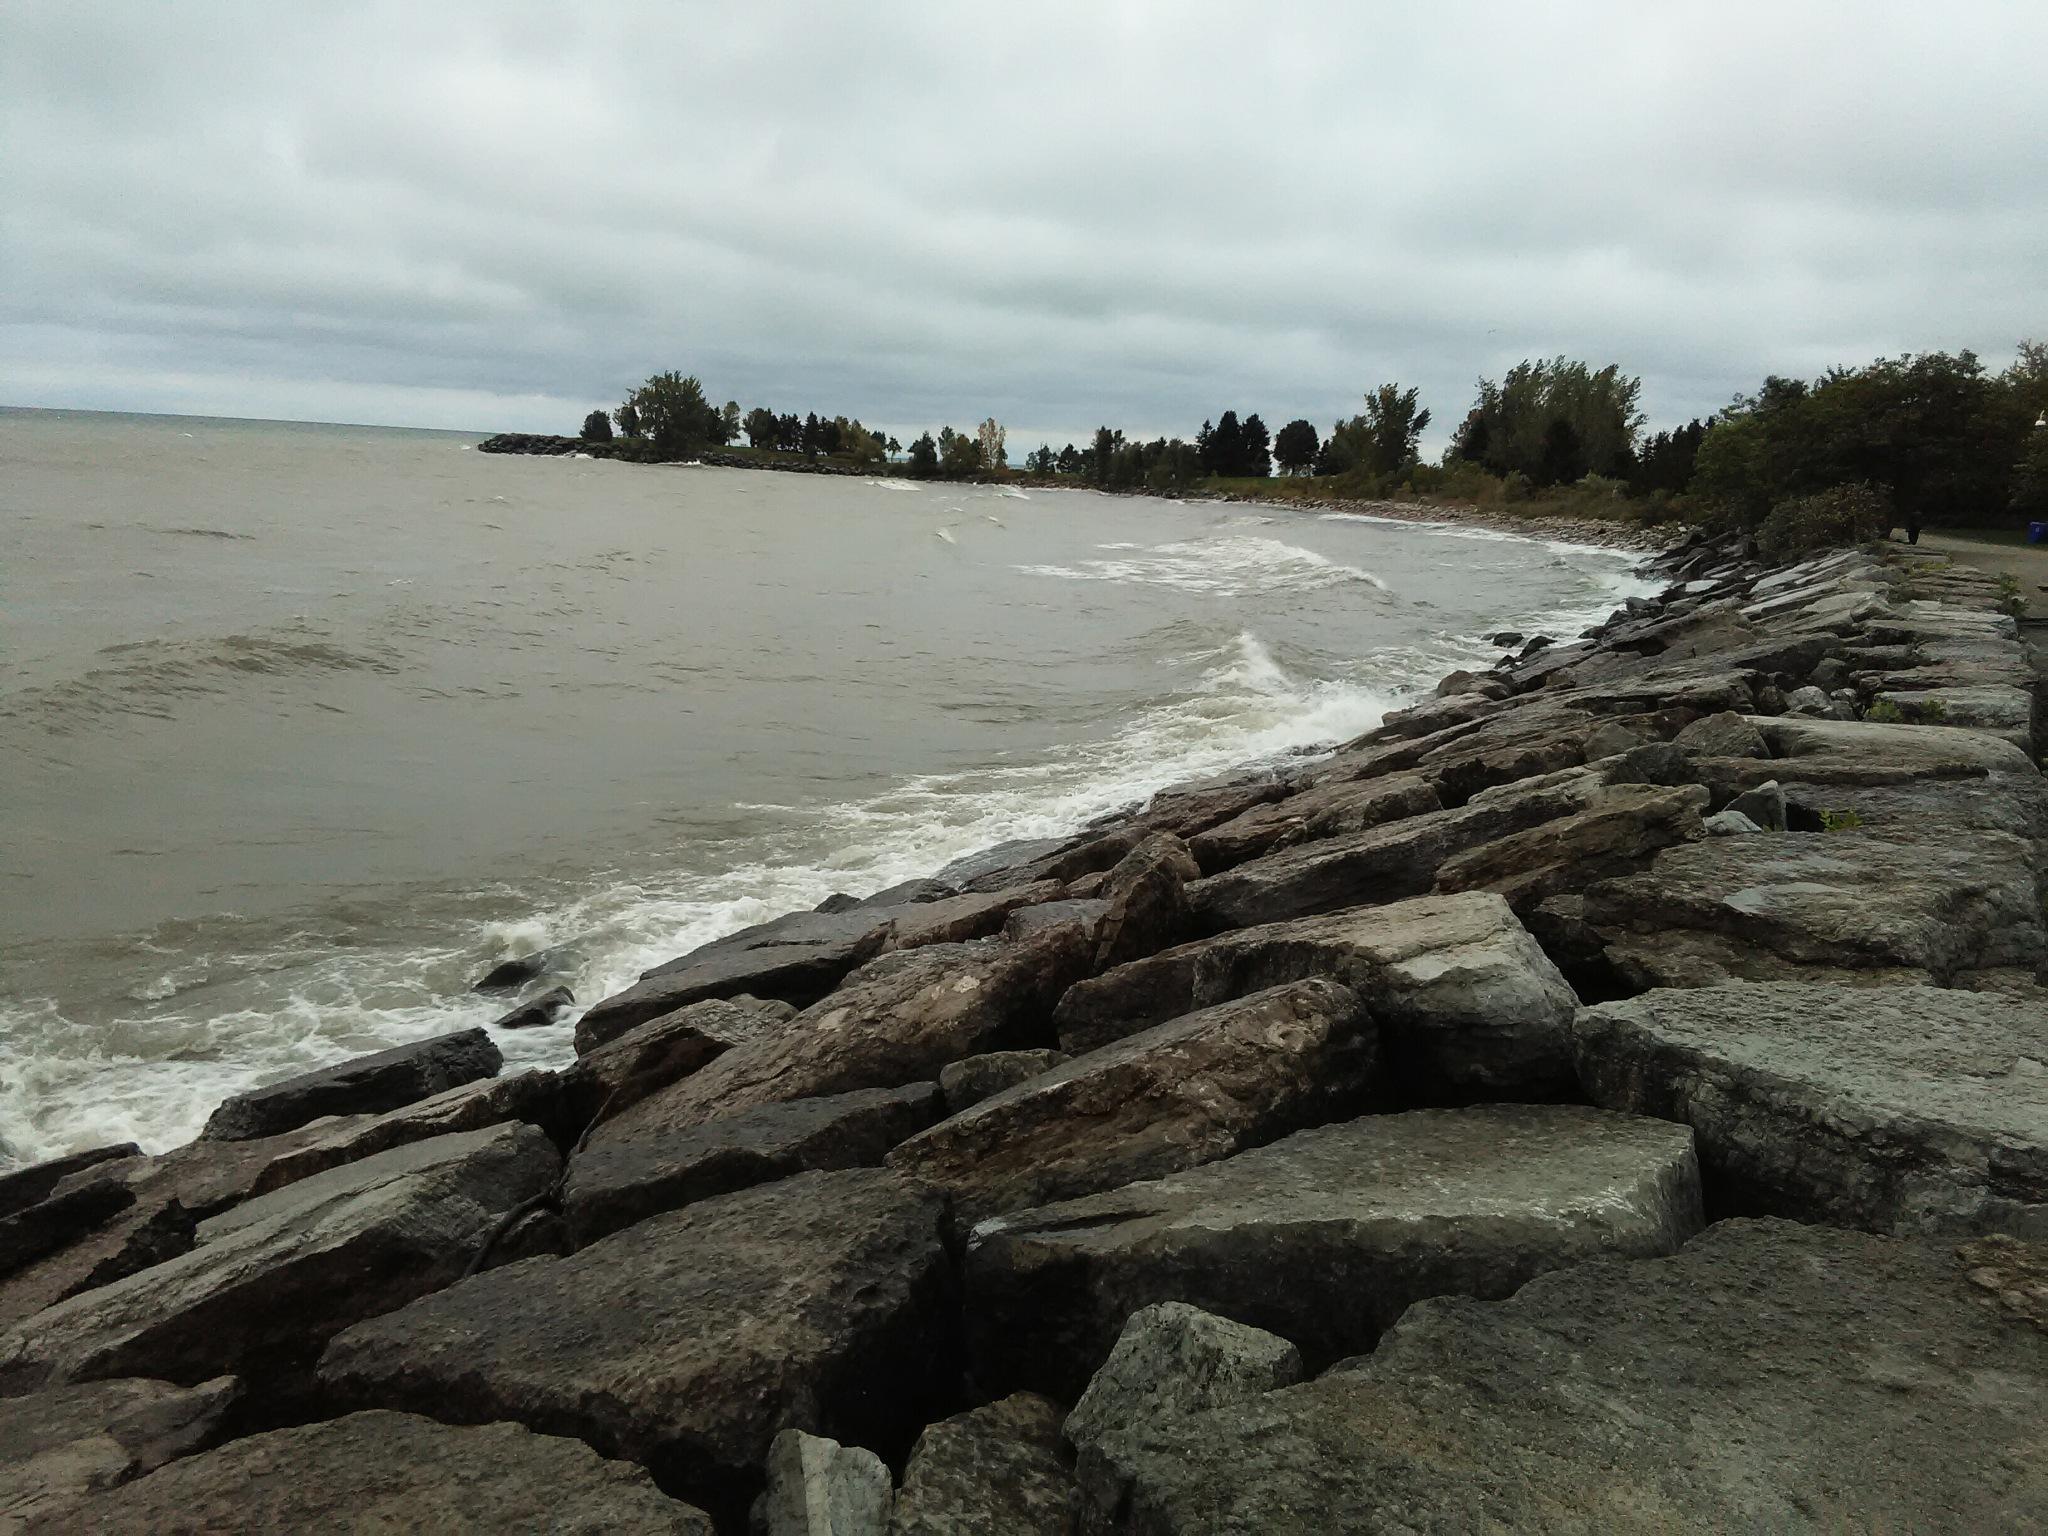 Lake Ontario, Scarborough Bluffs by smartin3380